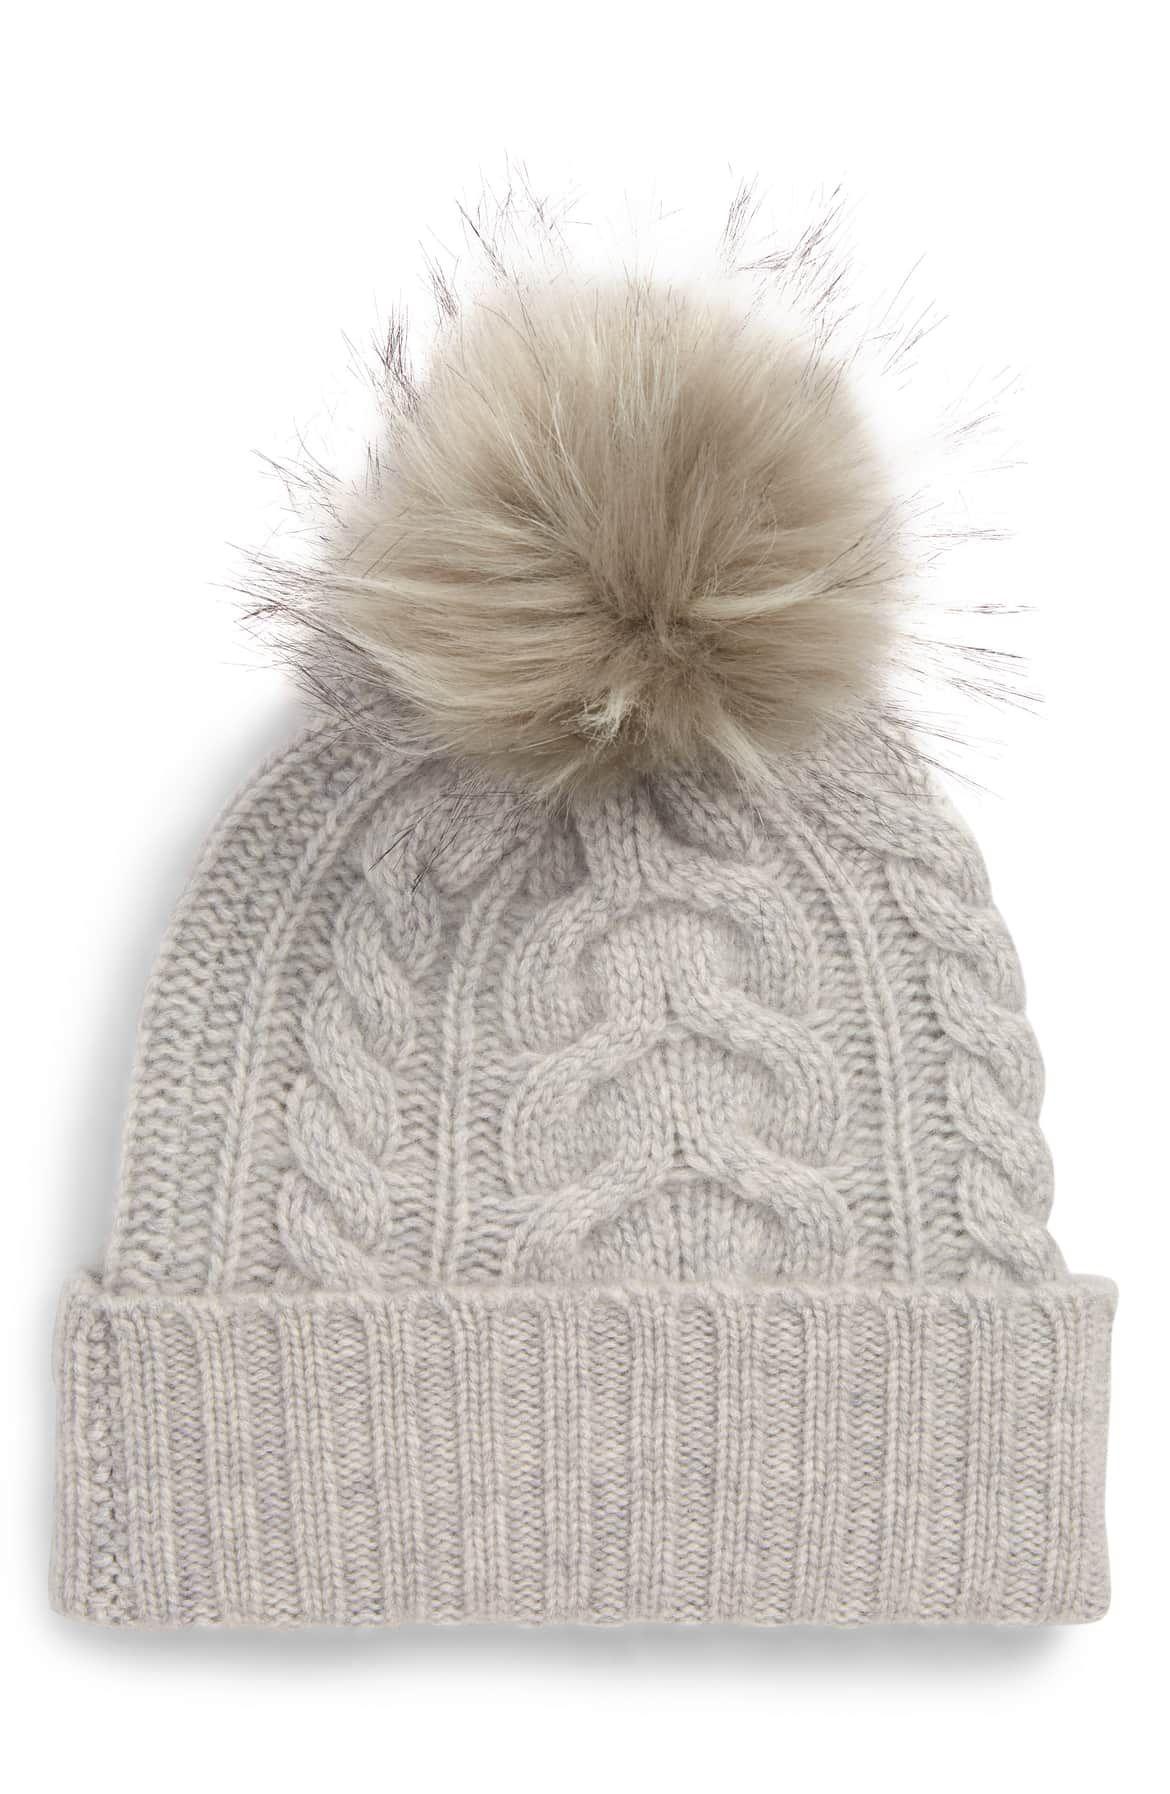 9e0fb5fc08e Cashmere Cable Knit Beanie with Faux Fur Pom